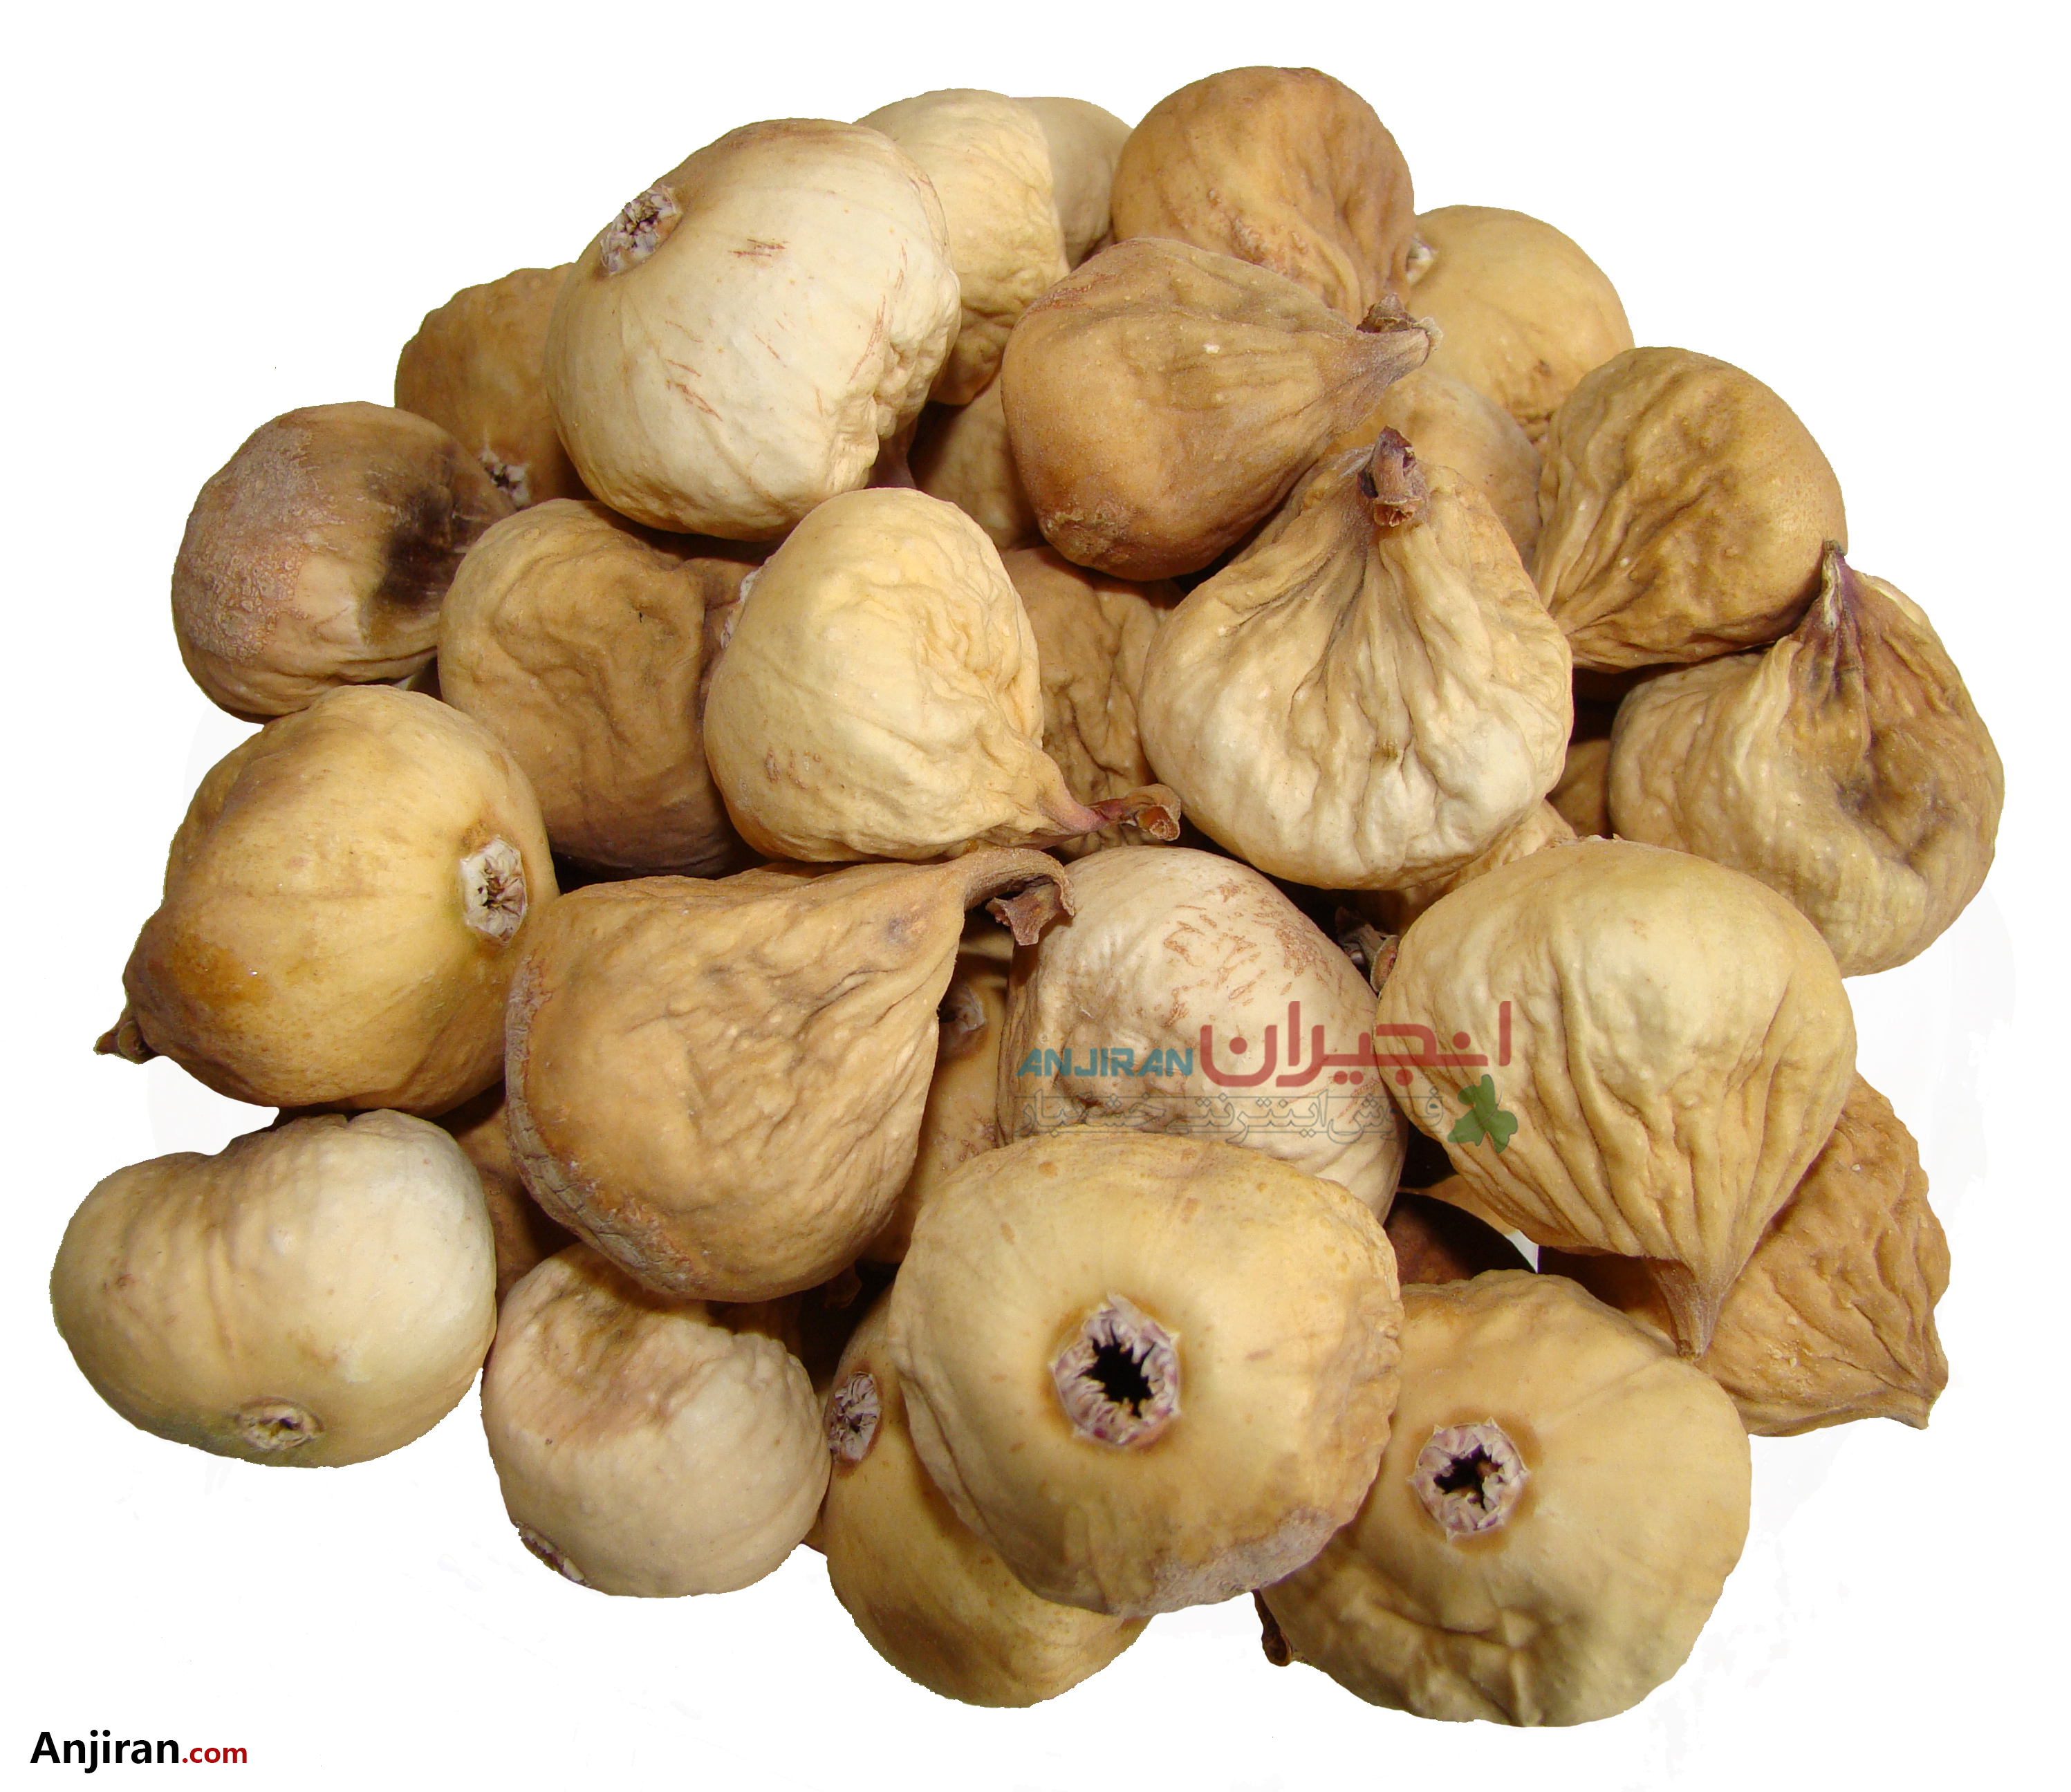 انجیر خشک بادکنکی - Balloon Dried Figs